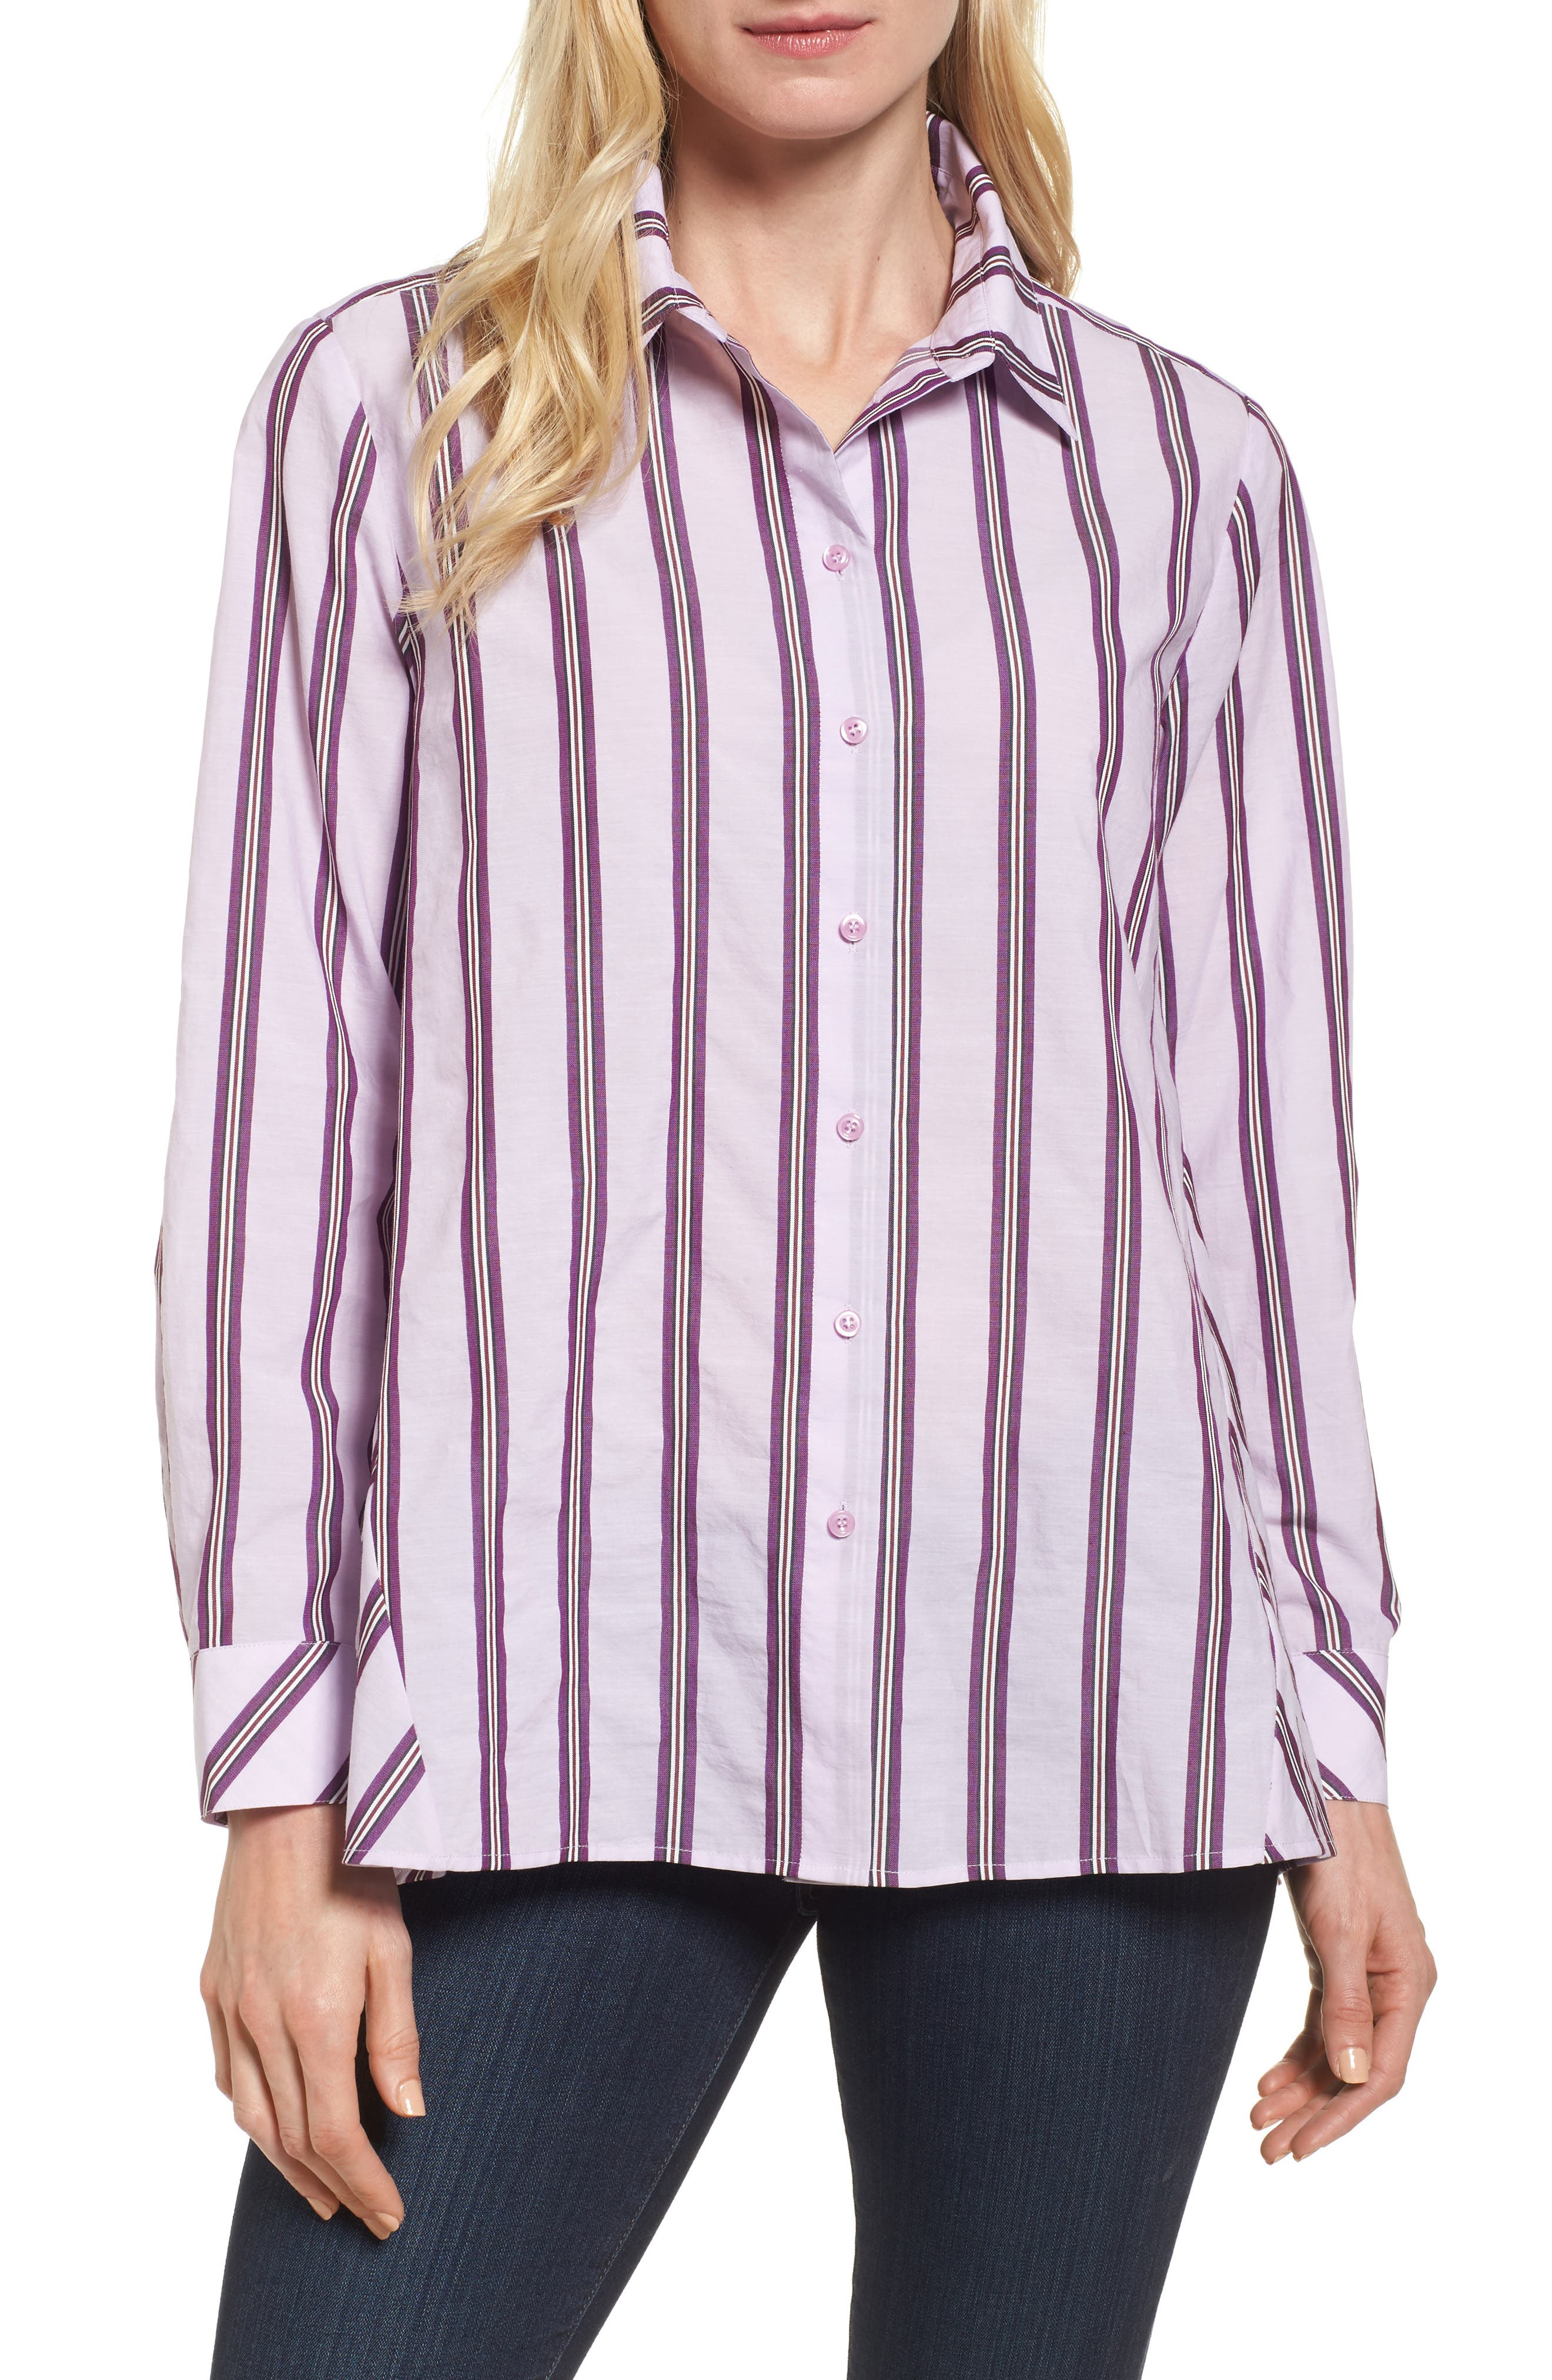 Alternate Image 1 Selected - Nordstrom Signature Oversize Stripe Shirt